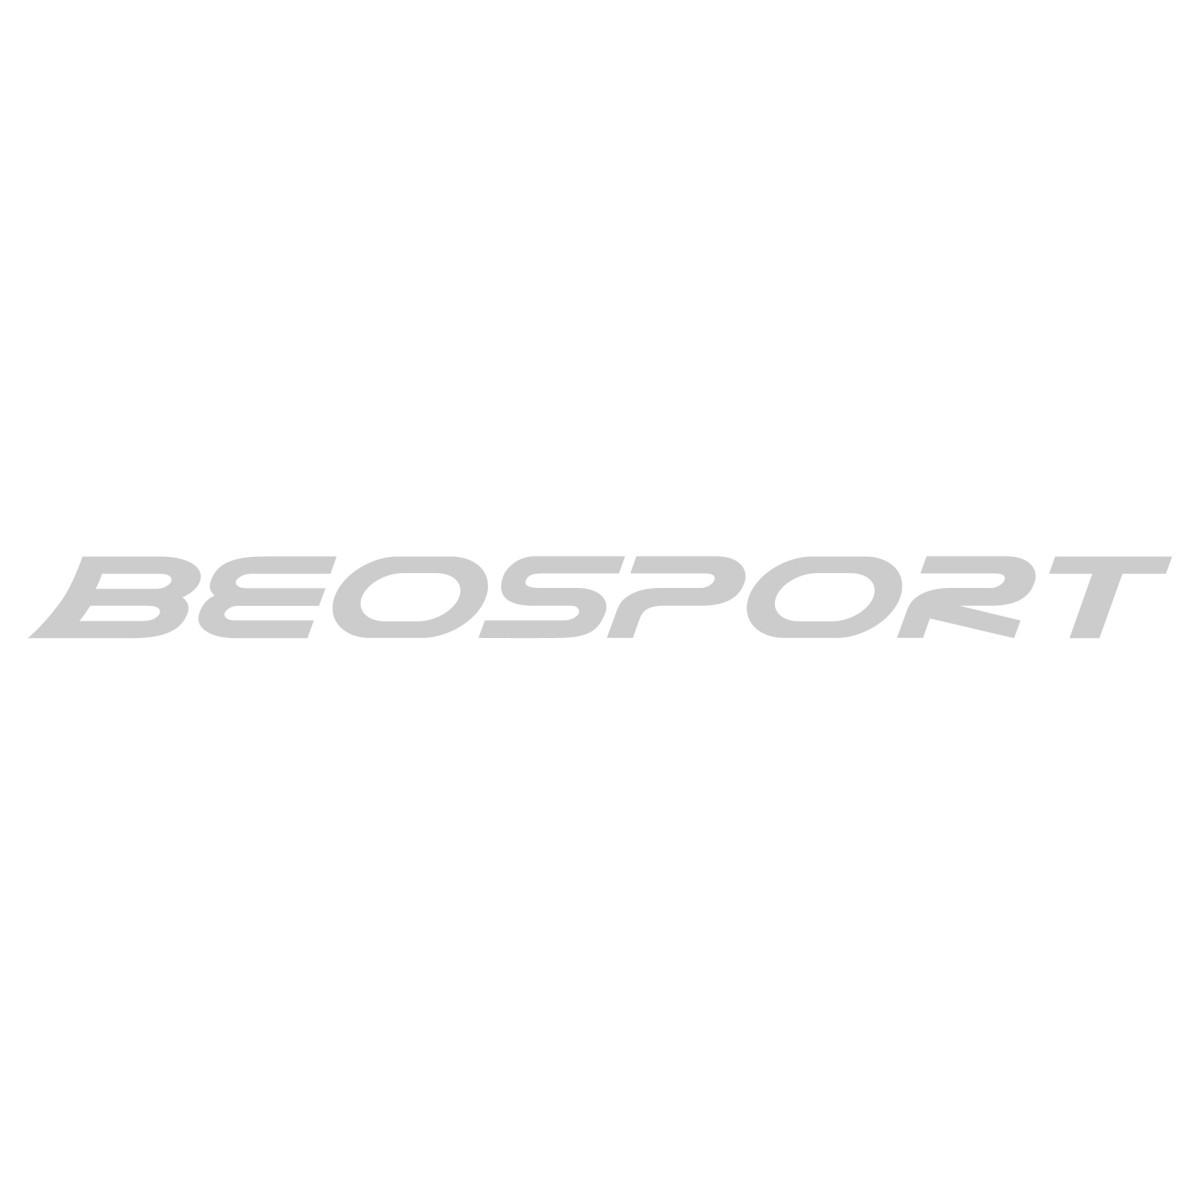 Wilson Element Rough 1.30mm x 200m žica za reket